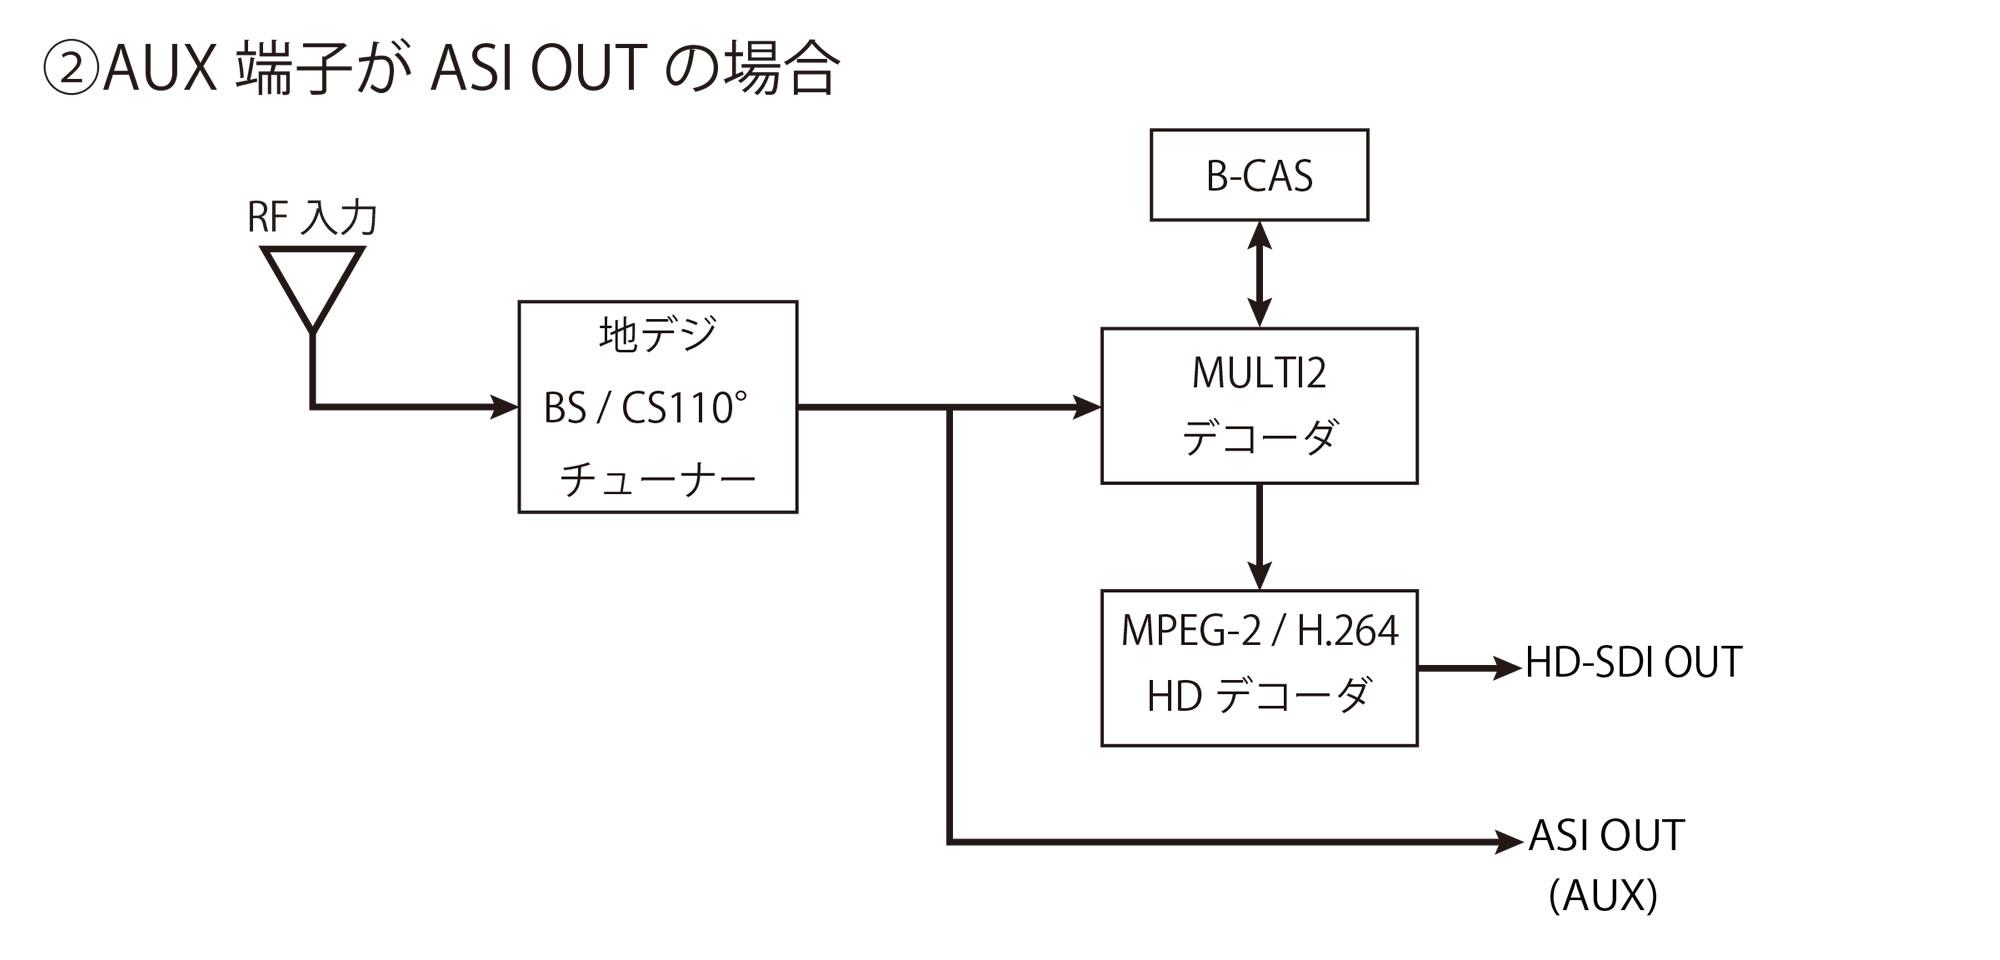 B-CAS デスクランブル